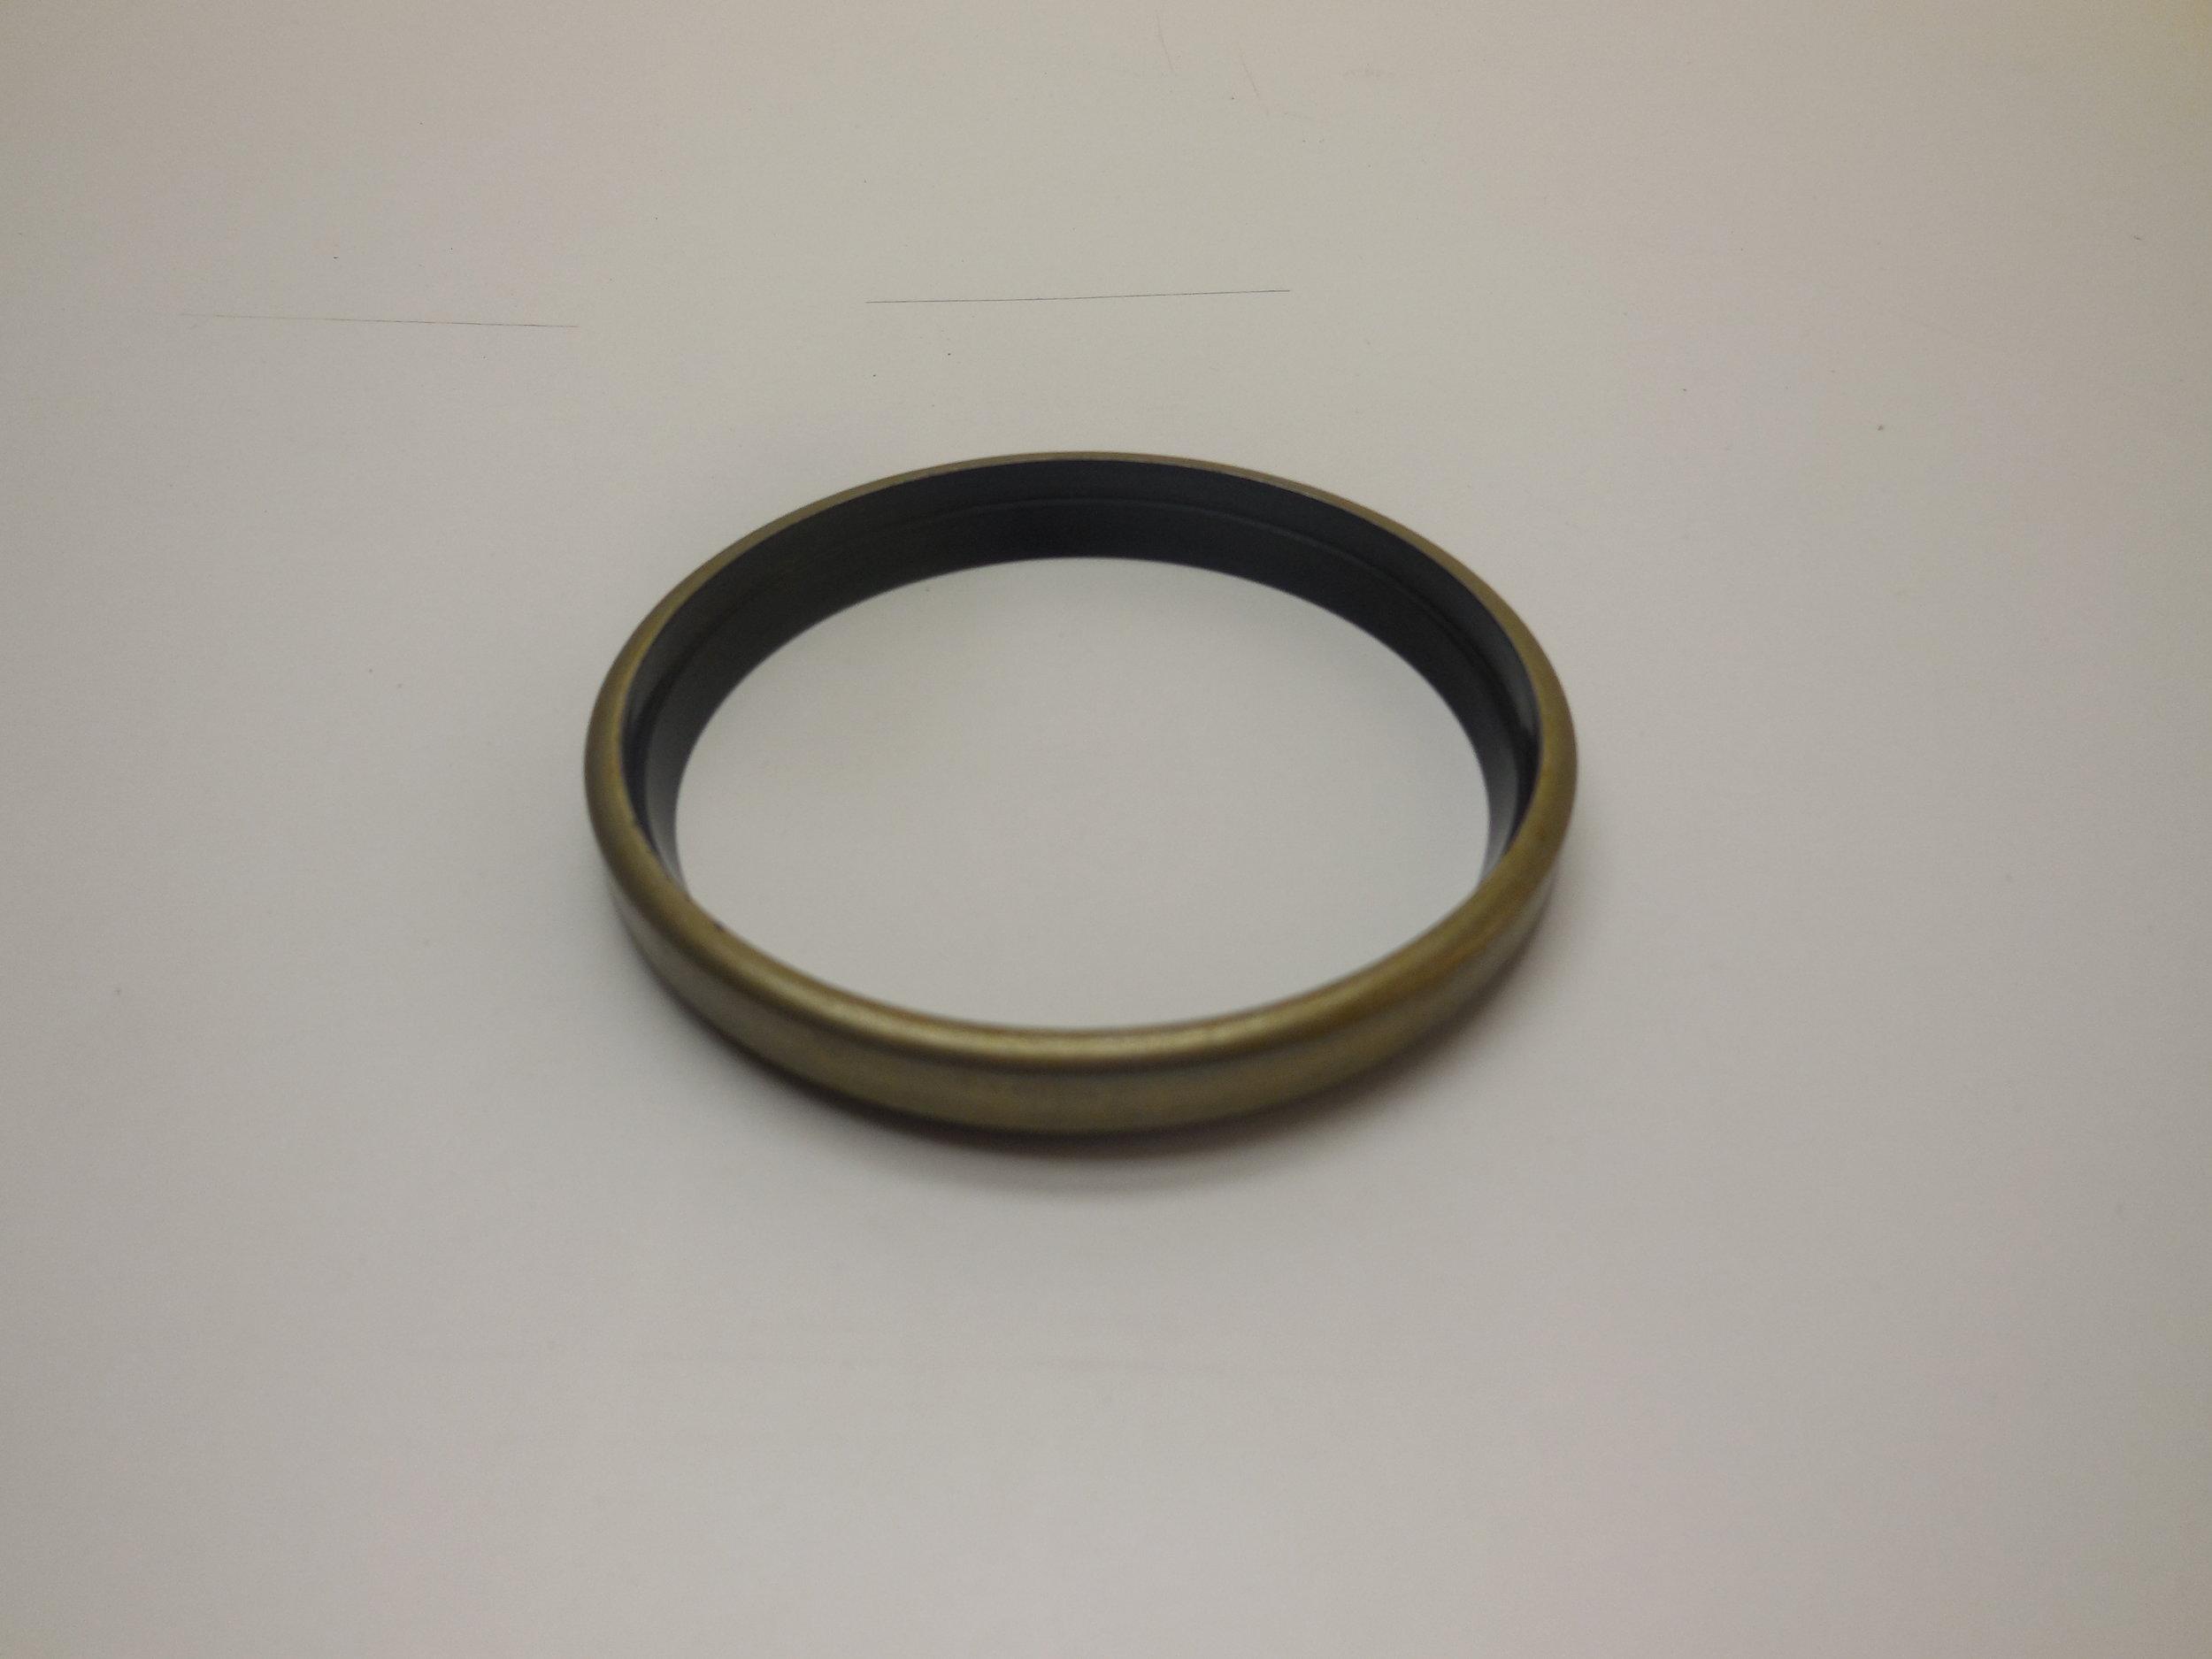 Stripper ring AS nr: 70-70-7 price: